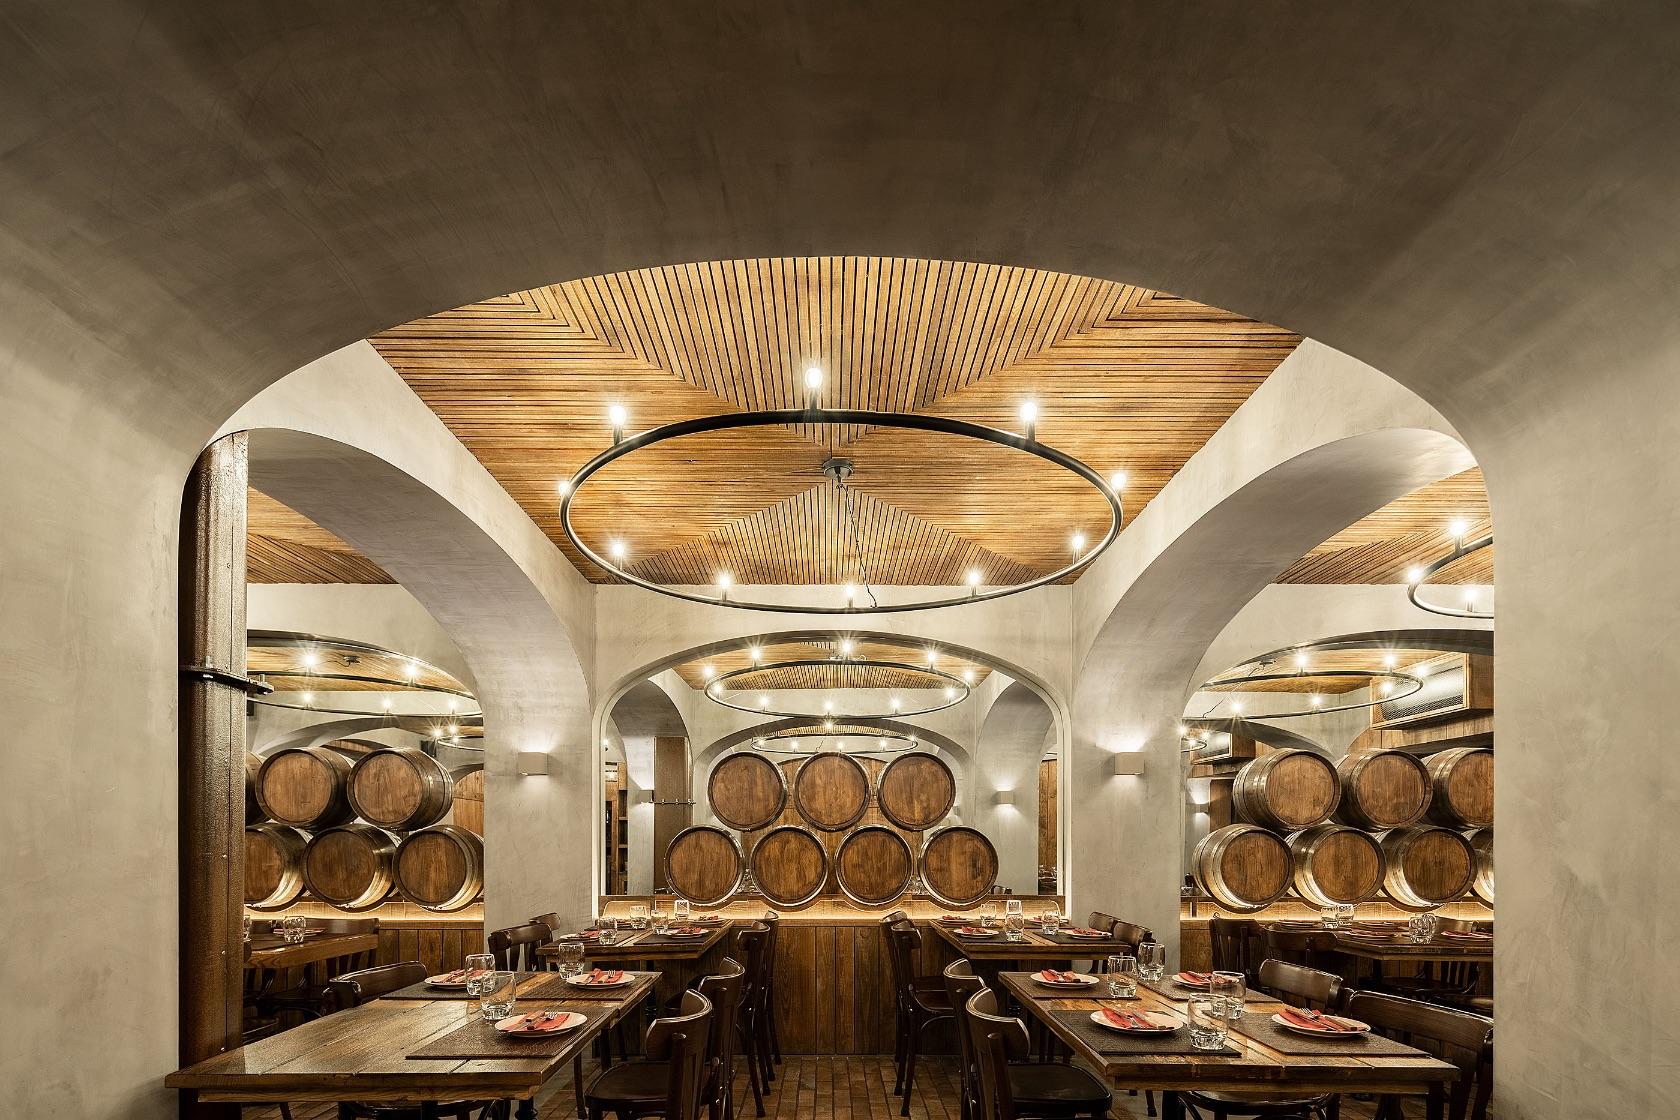 8_BARRIL Restaurant_PAULO MERLINI Architects_Inspirationist